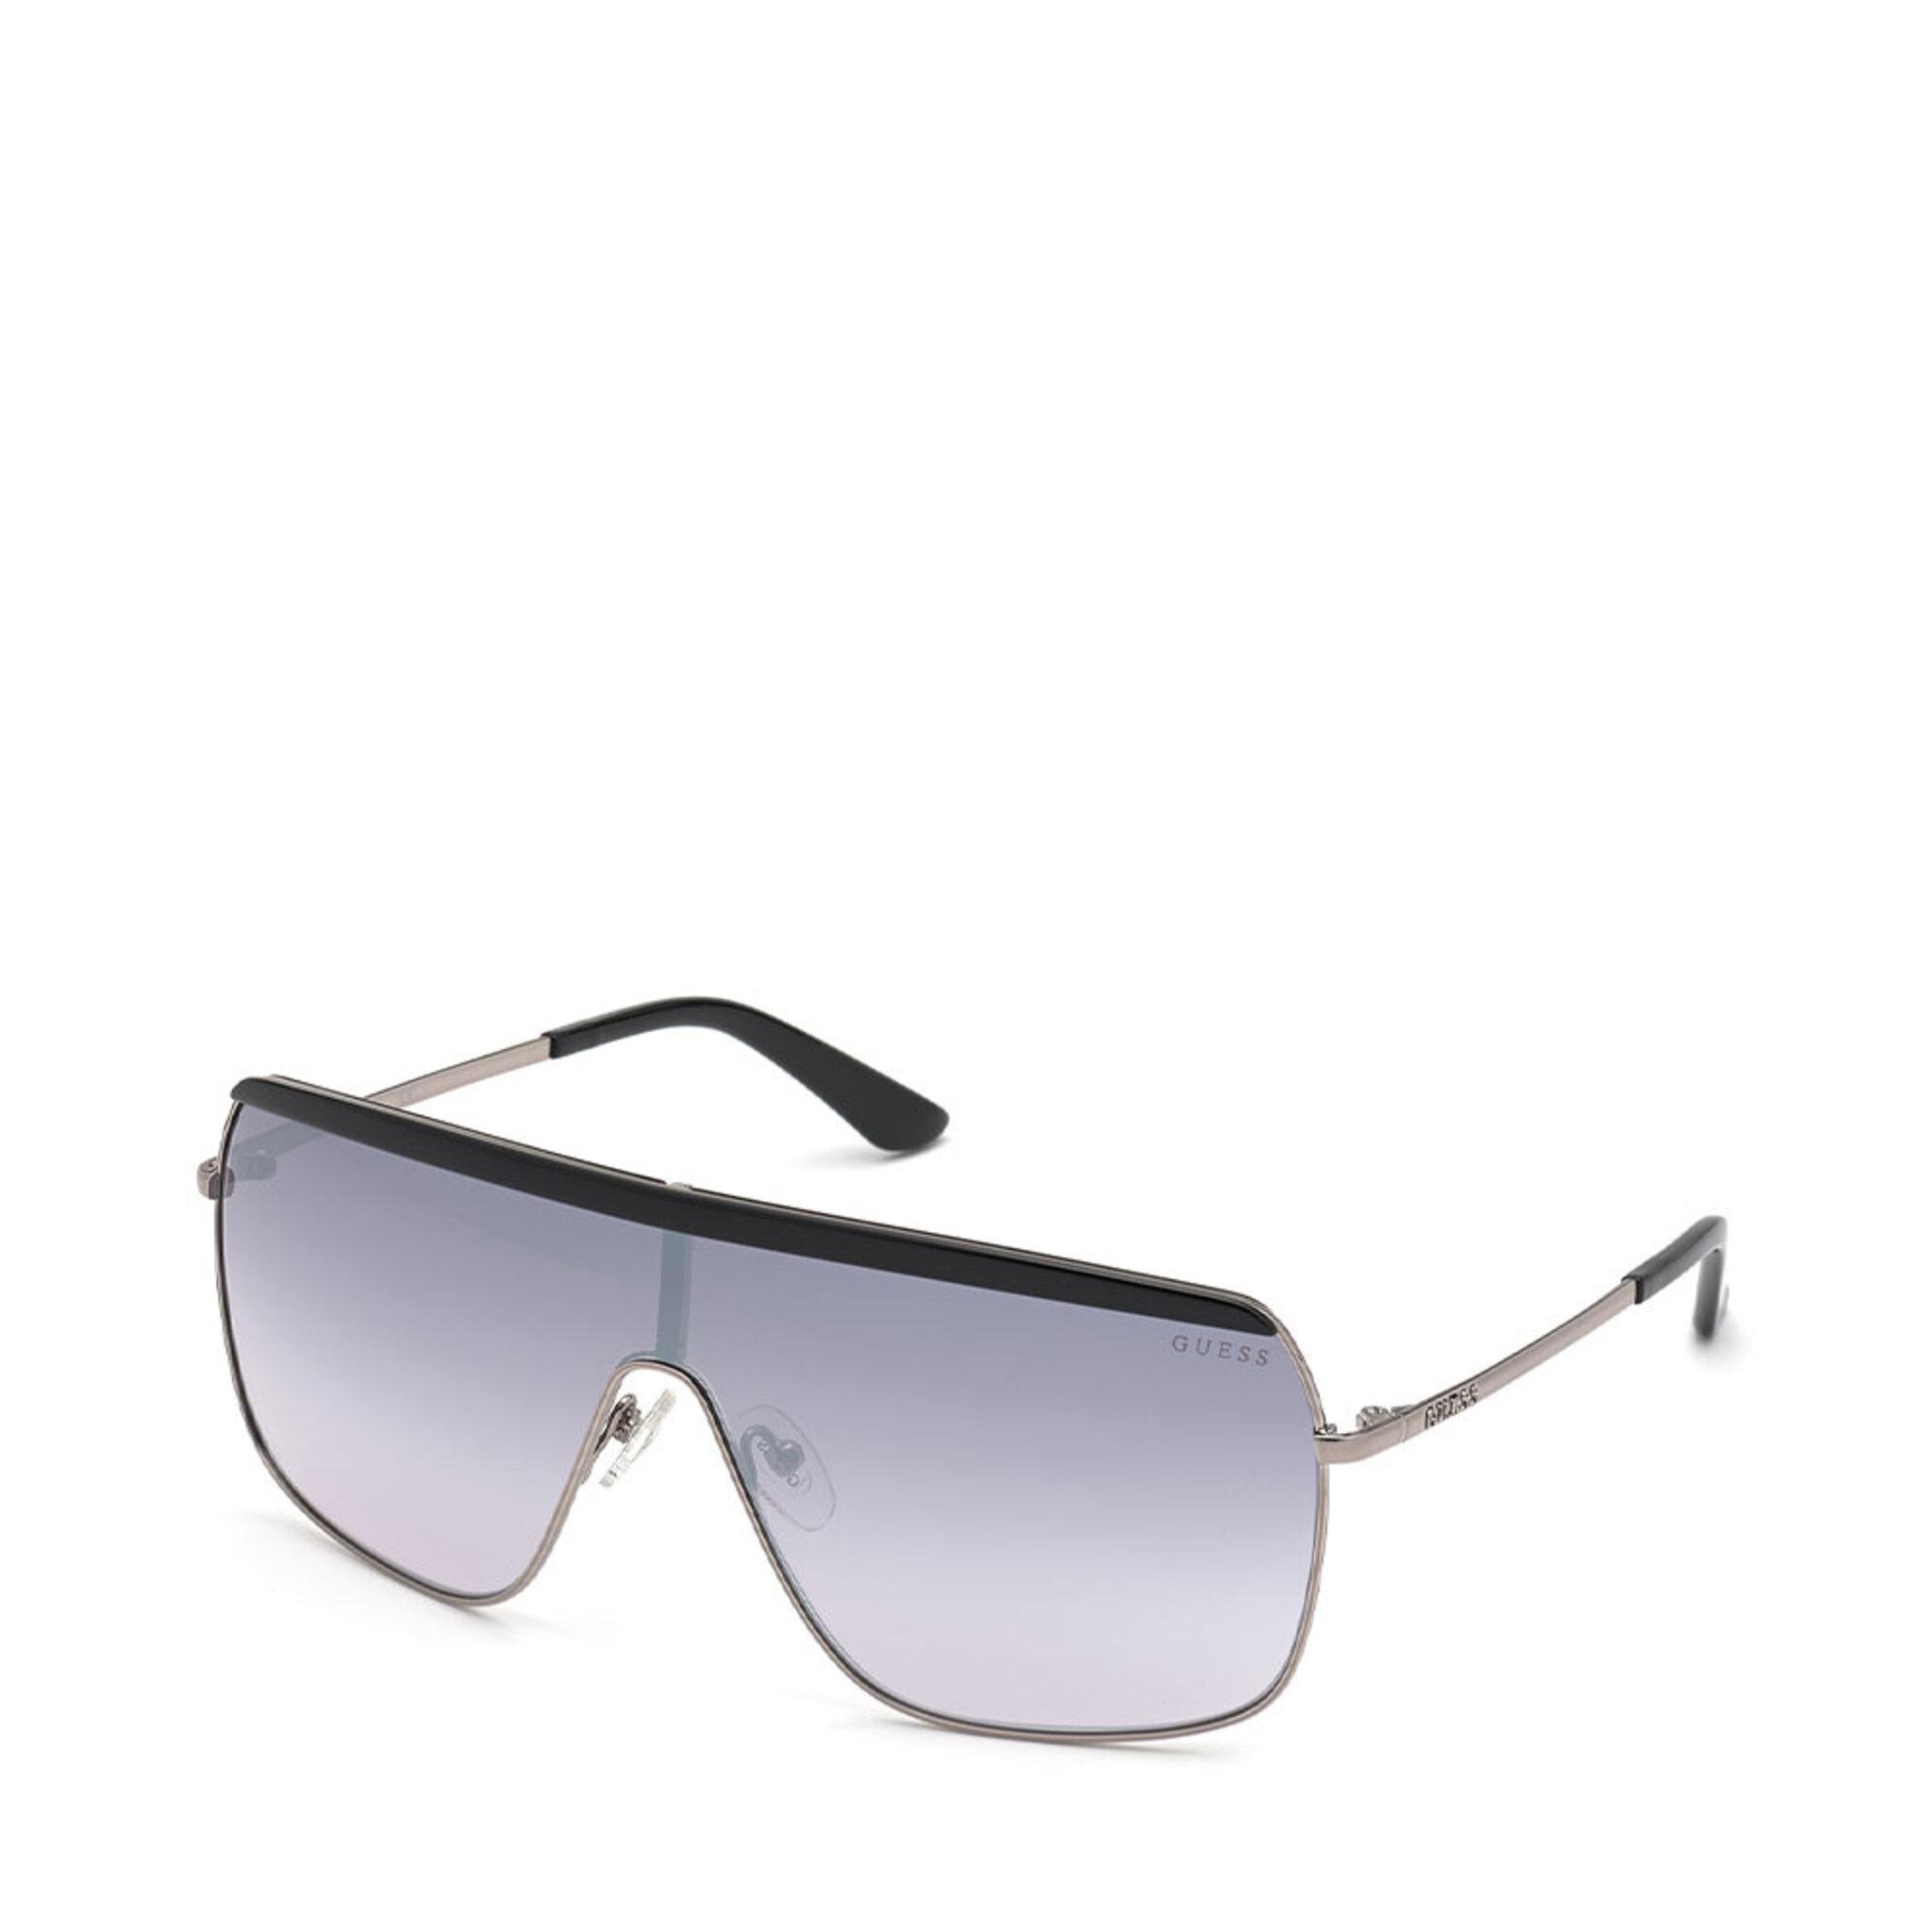 Sunglasses GU7737, ONE SIZE